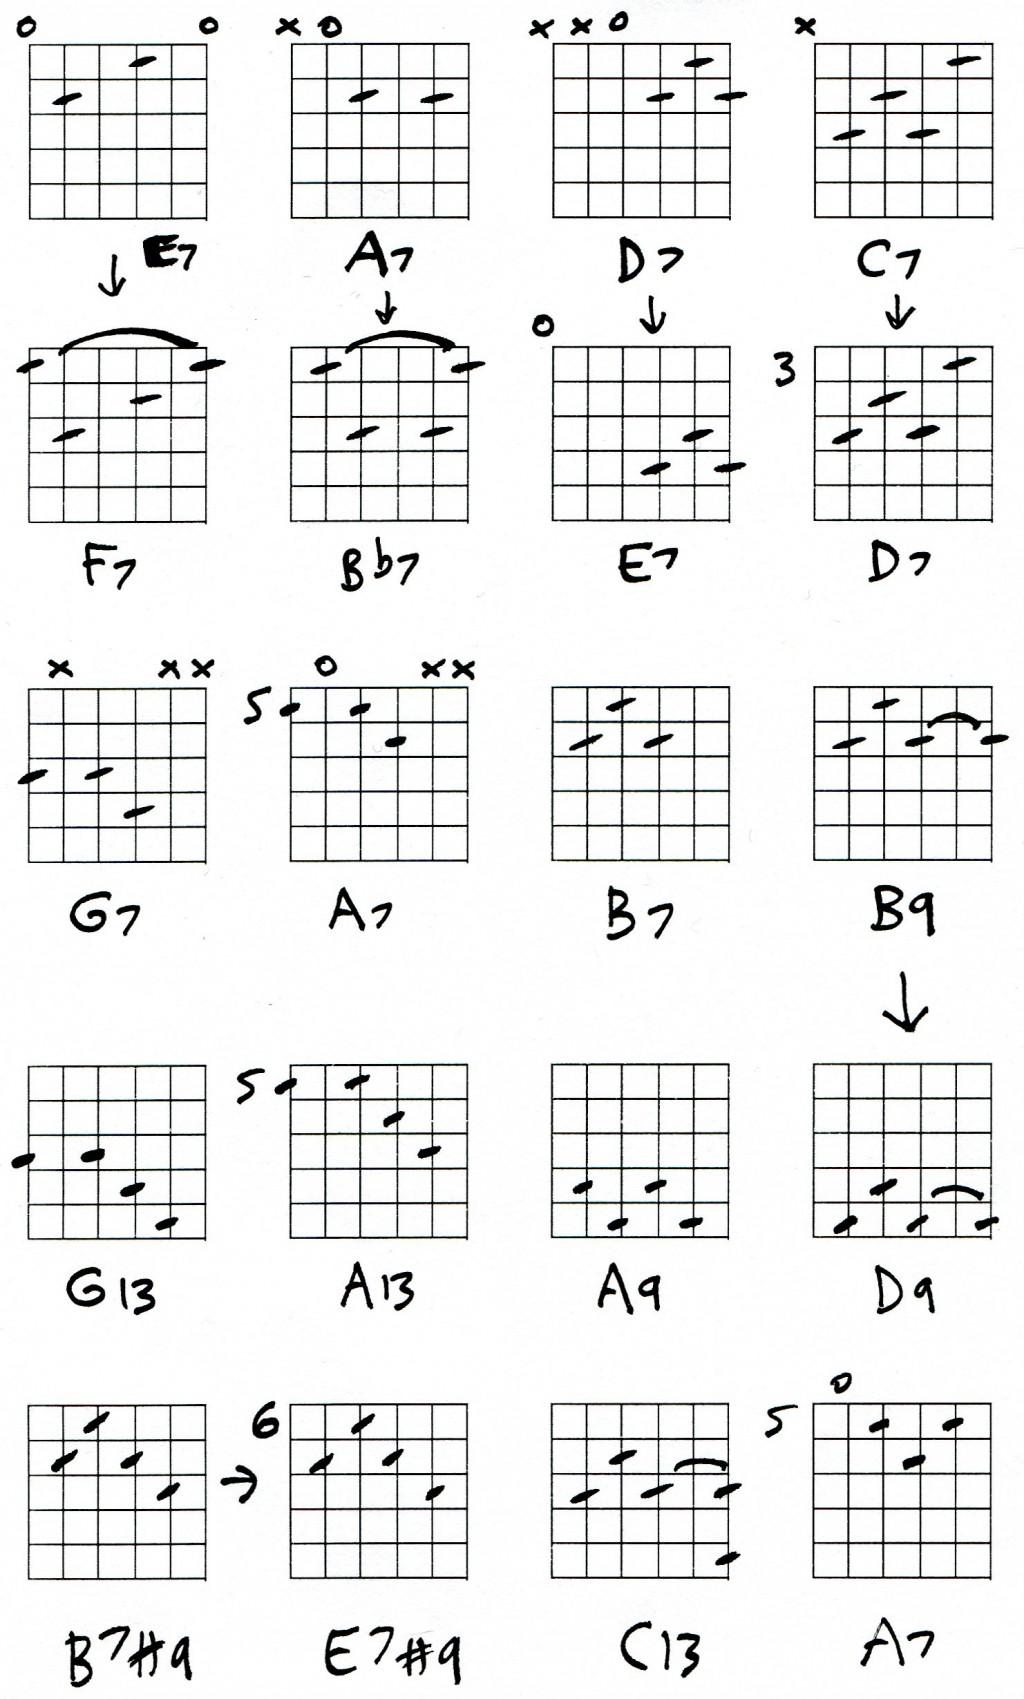 A7 Chord Ukulele E7 Guitar Chords Lesson